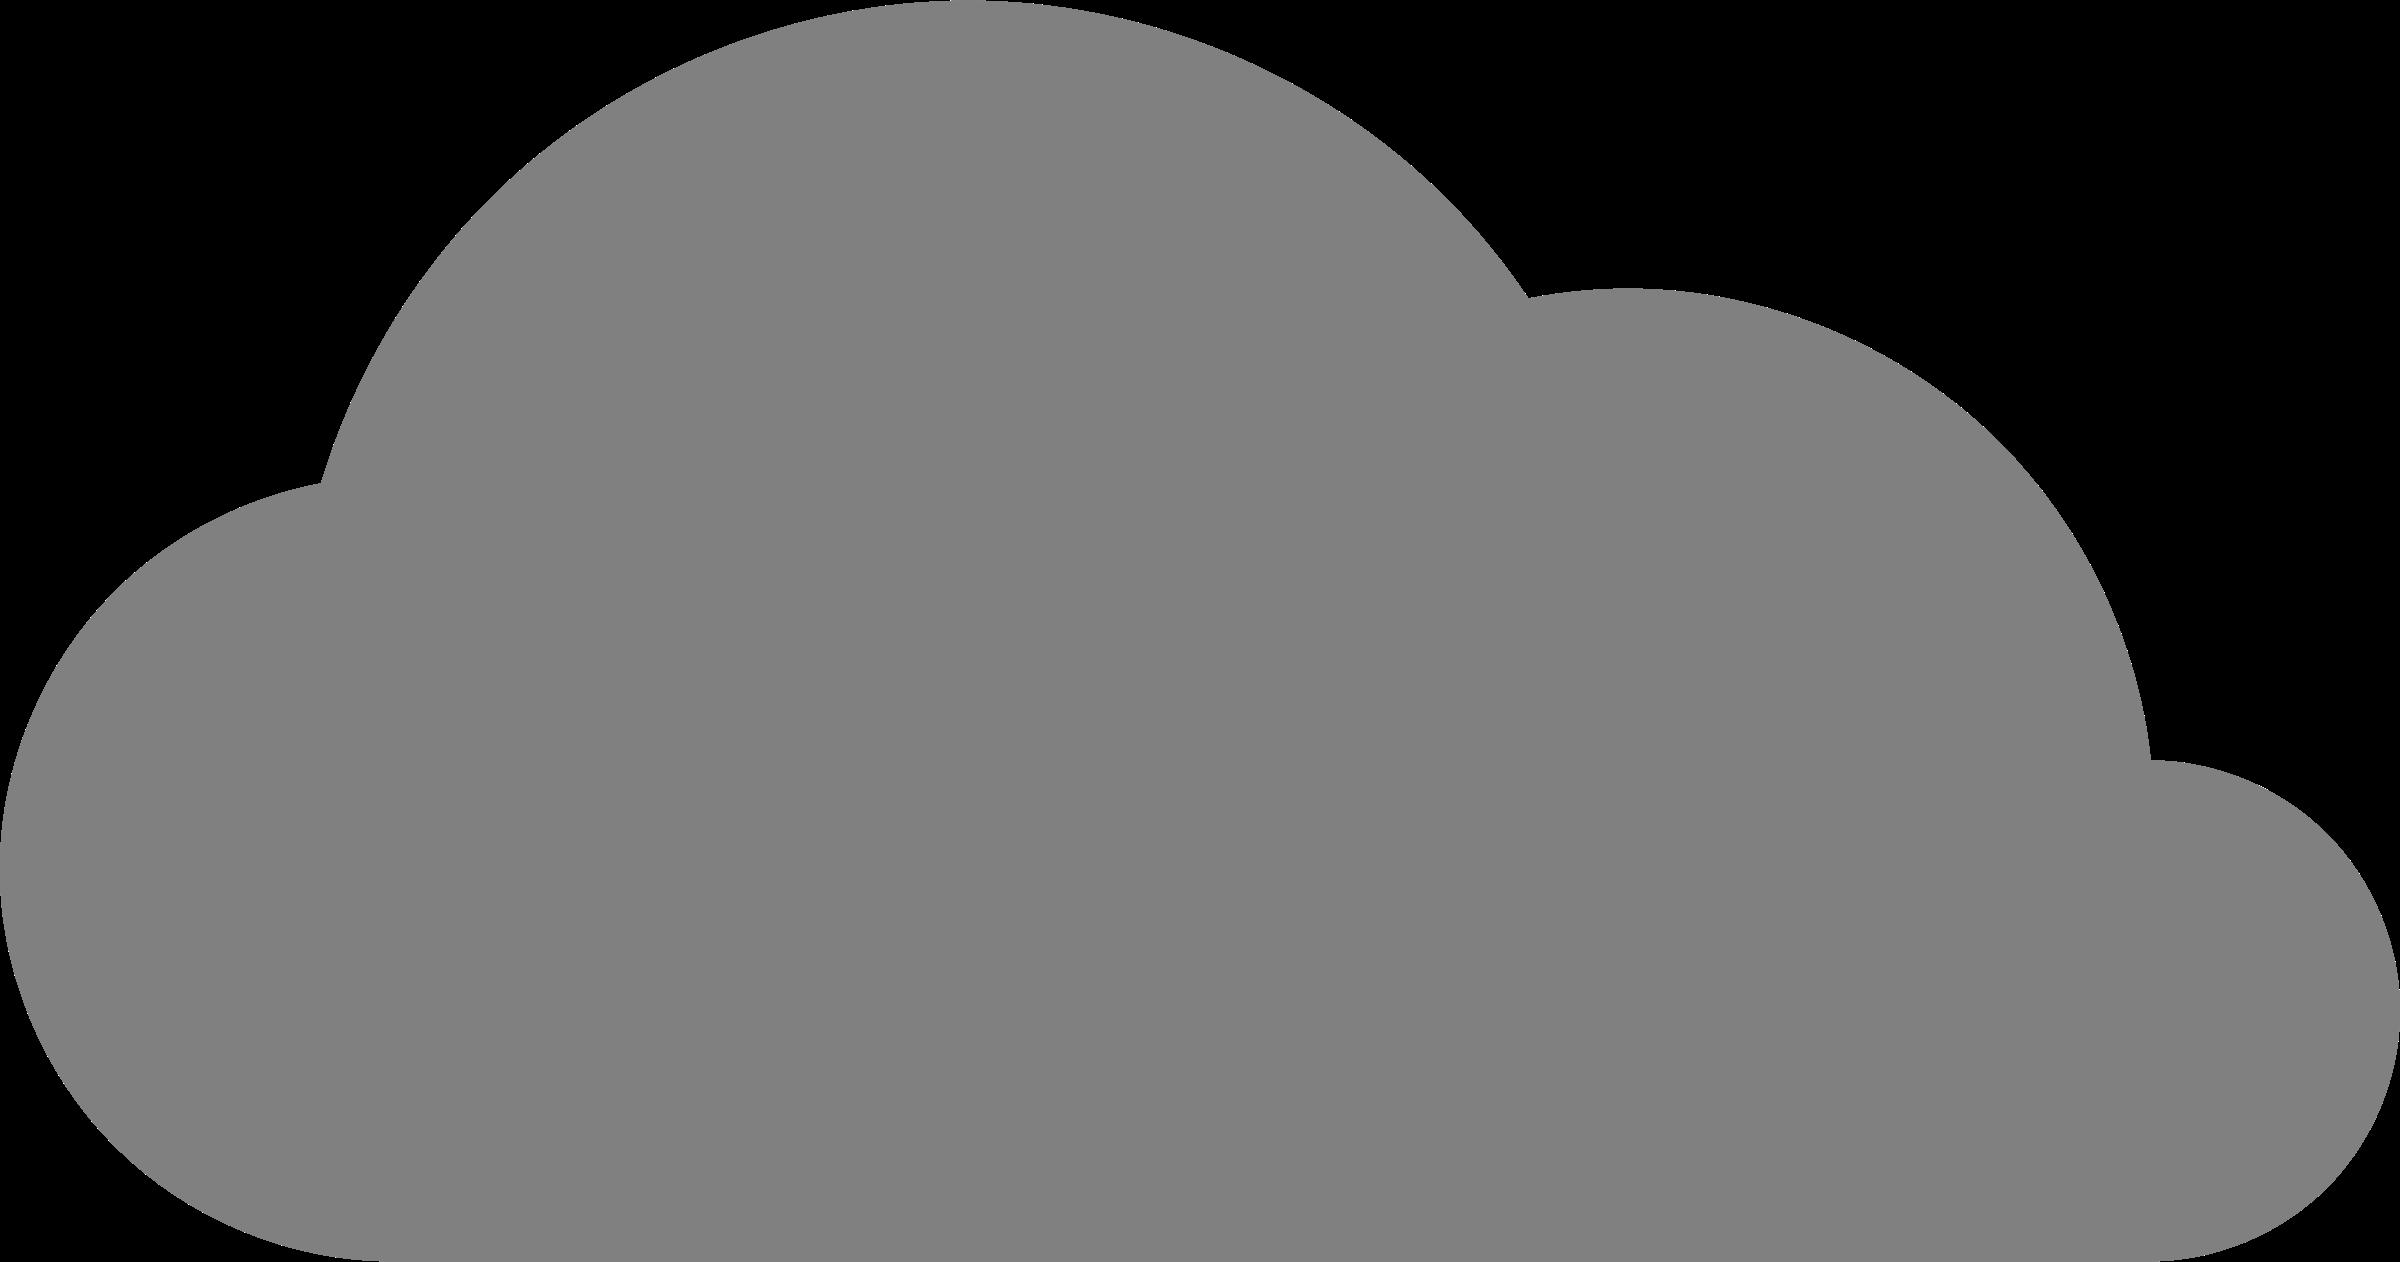 Cartoon Grey Cloud Png Clipart Full Size Clipart 1881845 Pinclipart